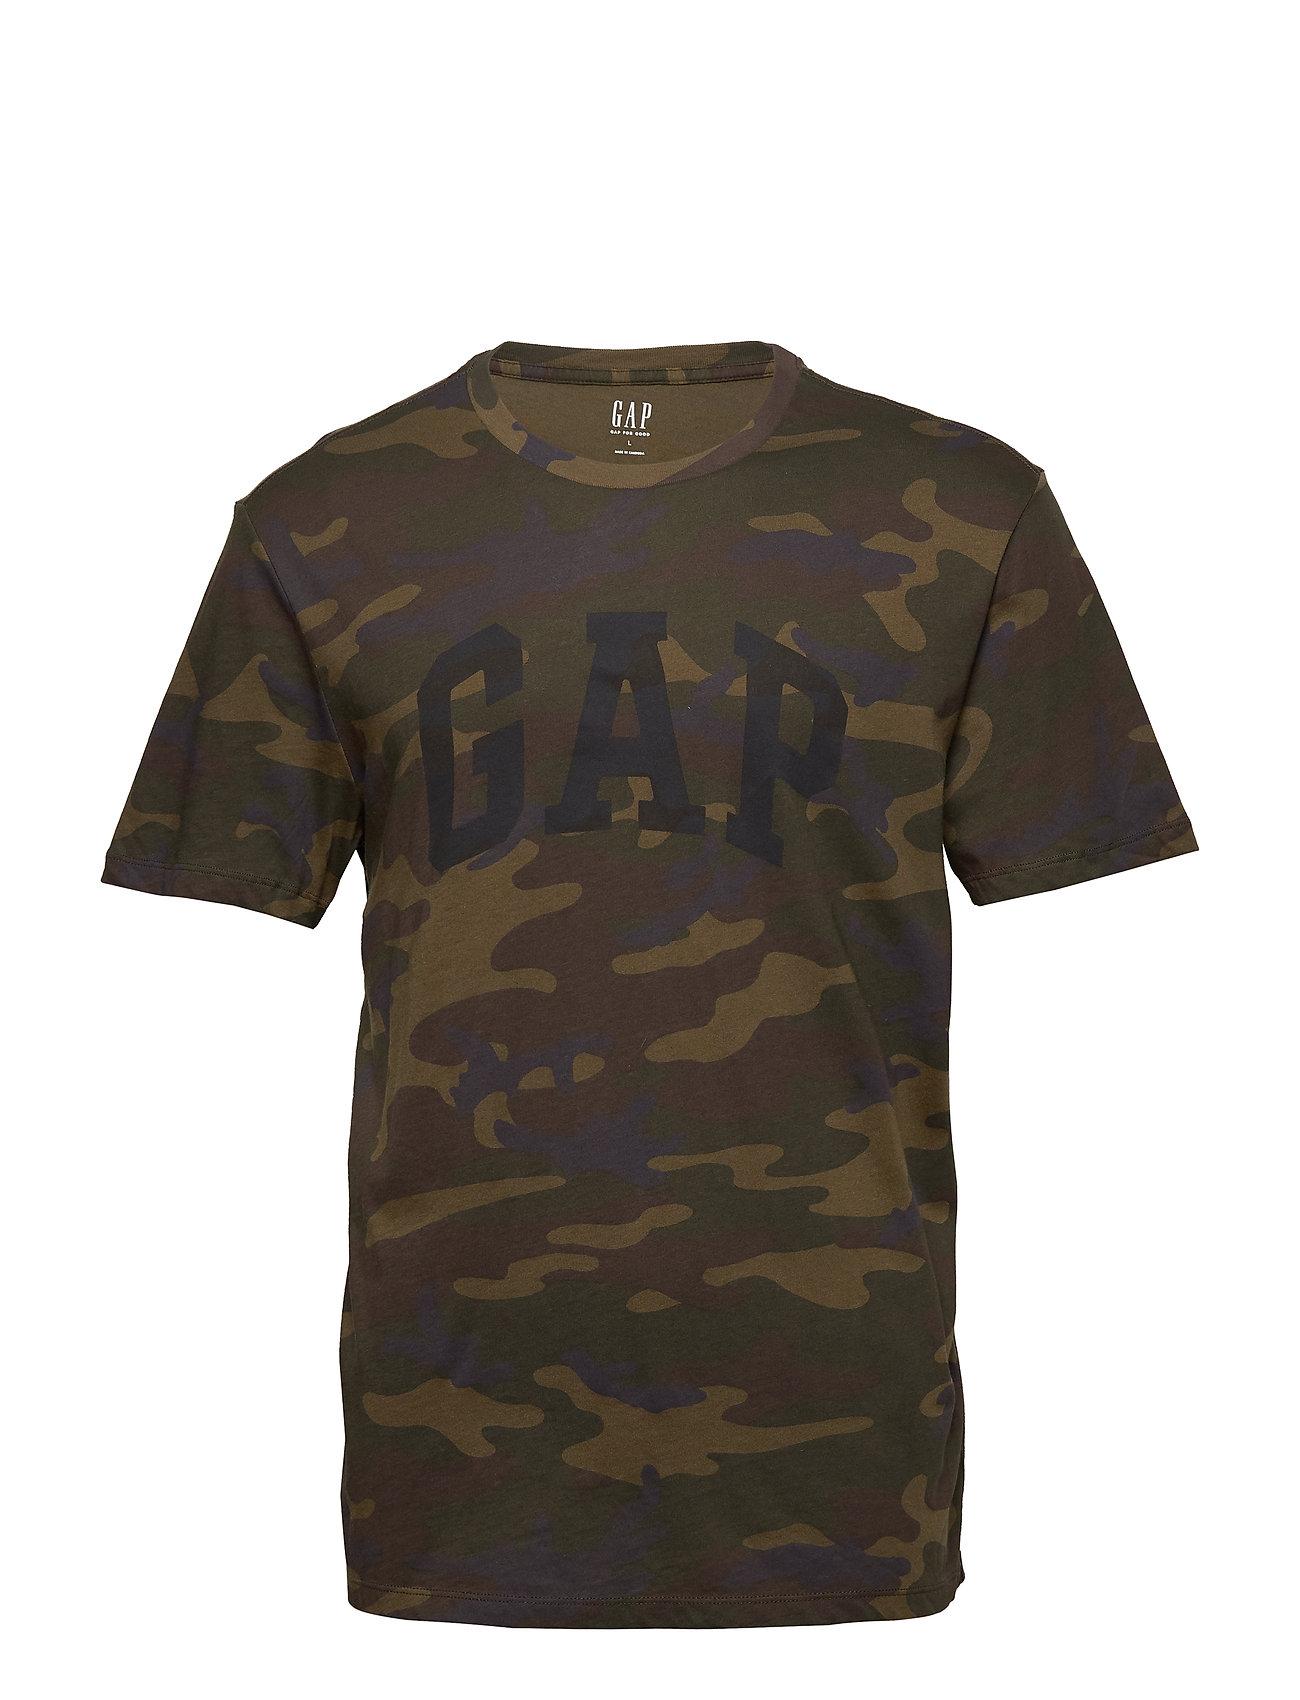 GAP Logo Camo Print T-Shirt - CAMO PRINT